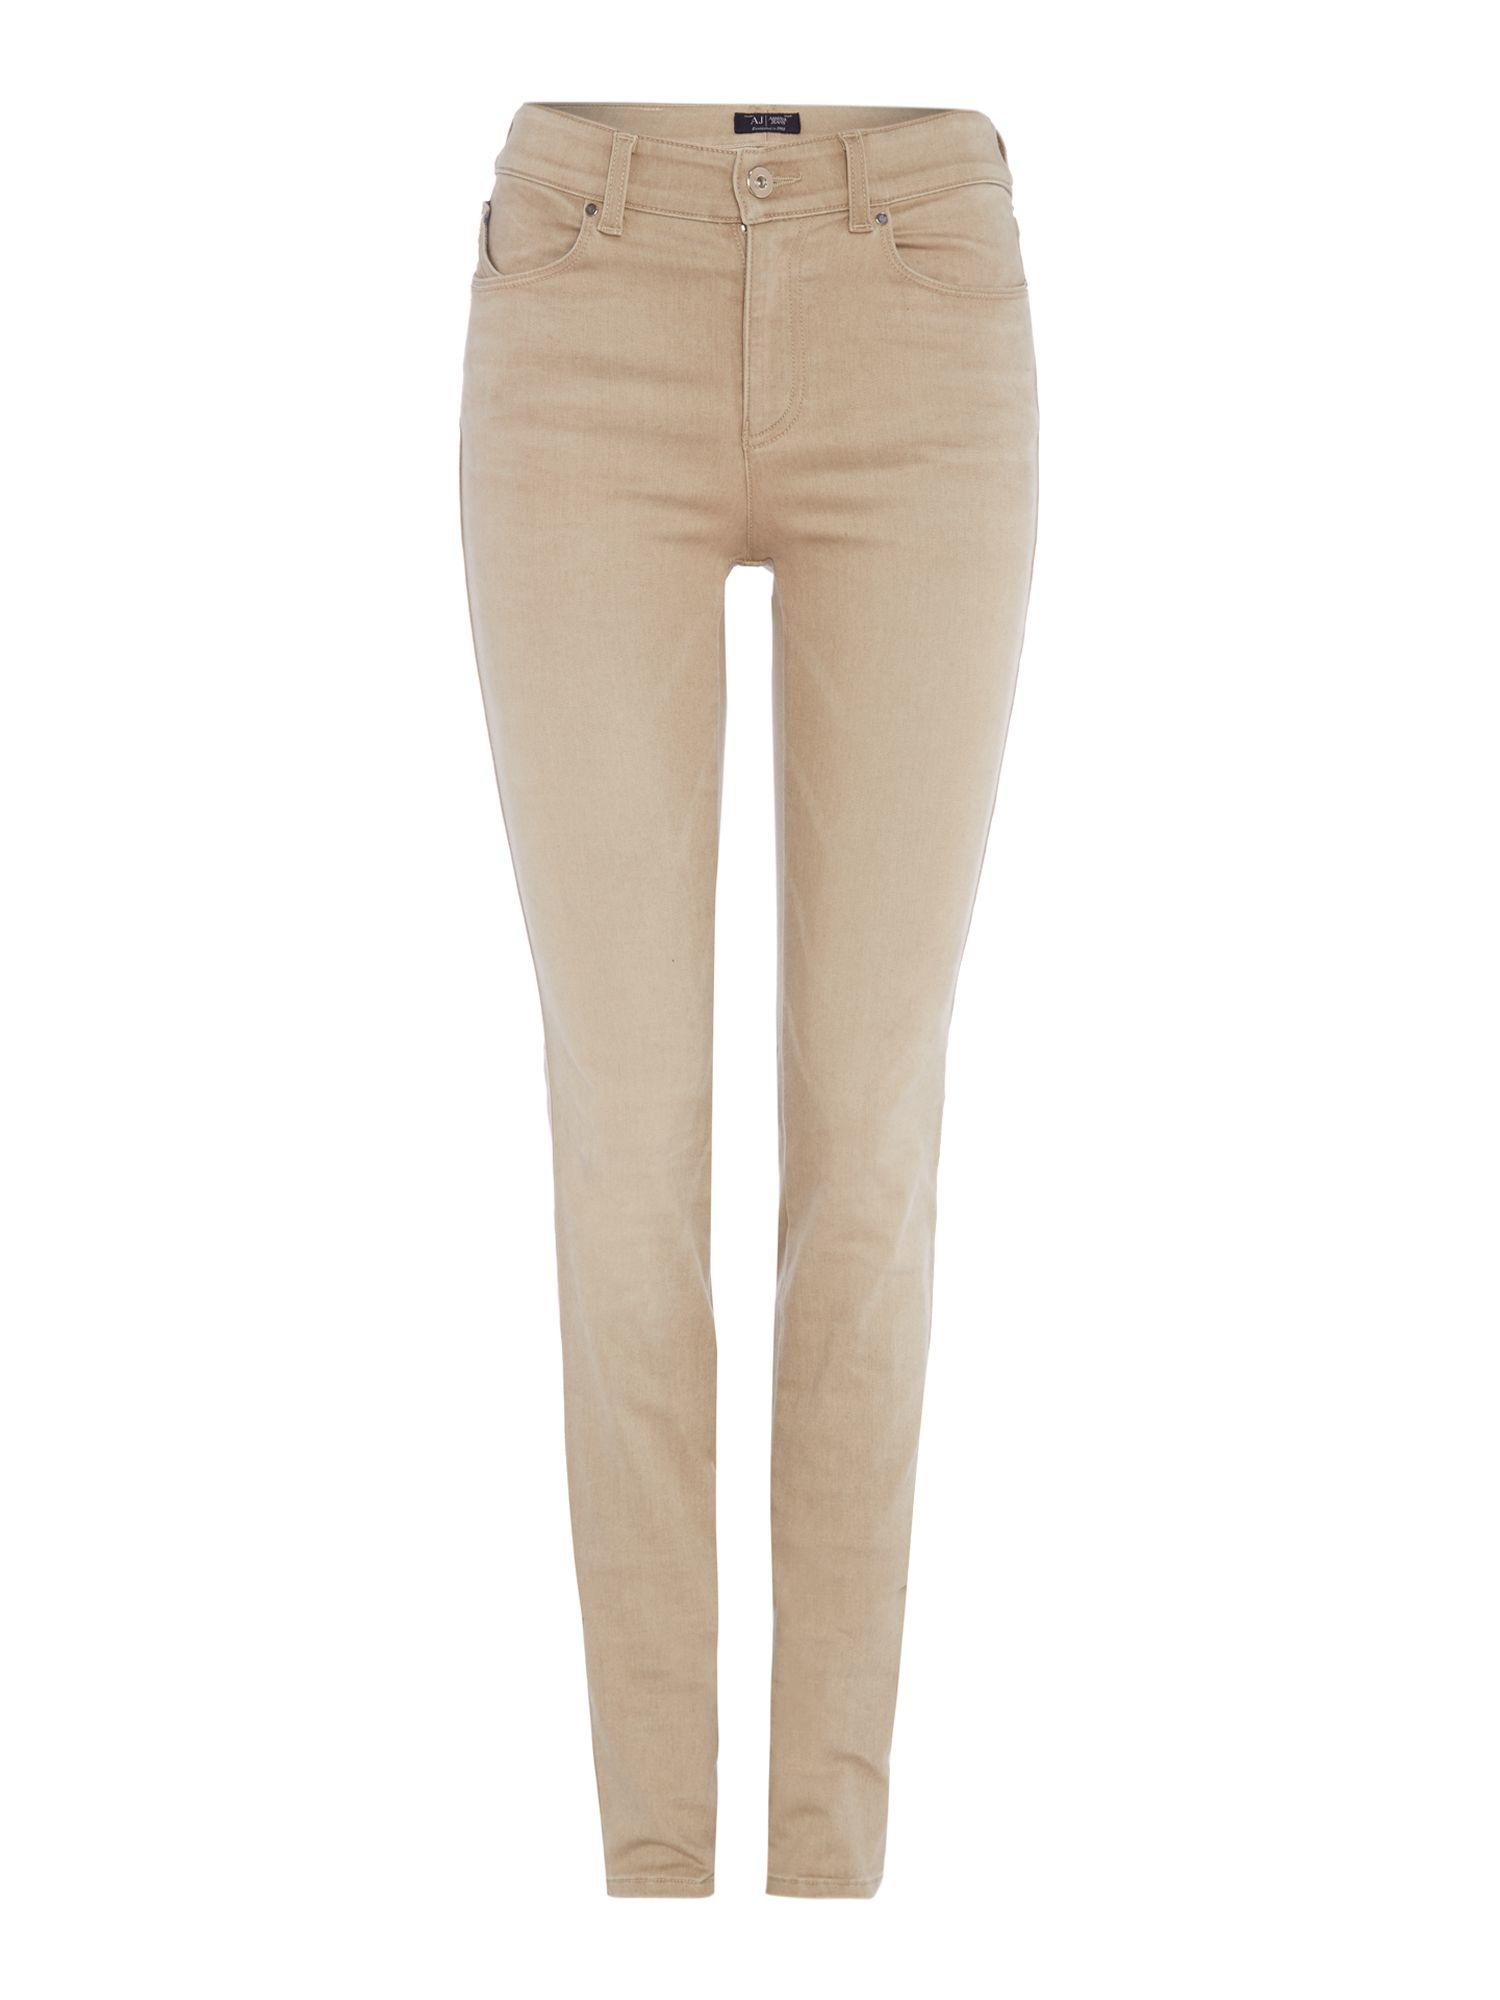 Armani Jeans Messenger Bag House Of Fraser Frenchafricana. House Of Fraser  Deals S For February 2019 Hotukdeals 4719505892159